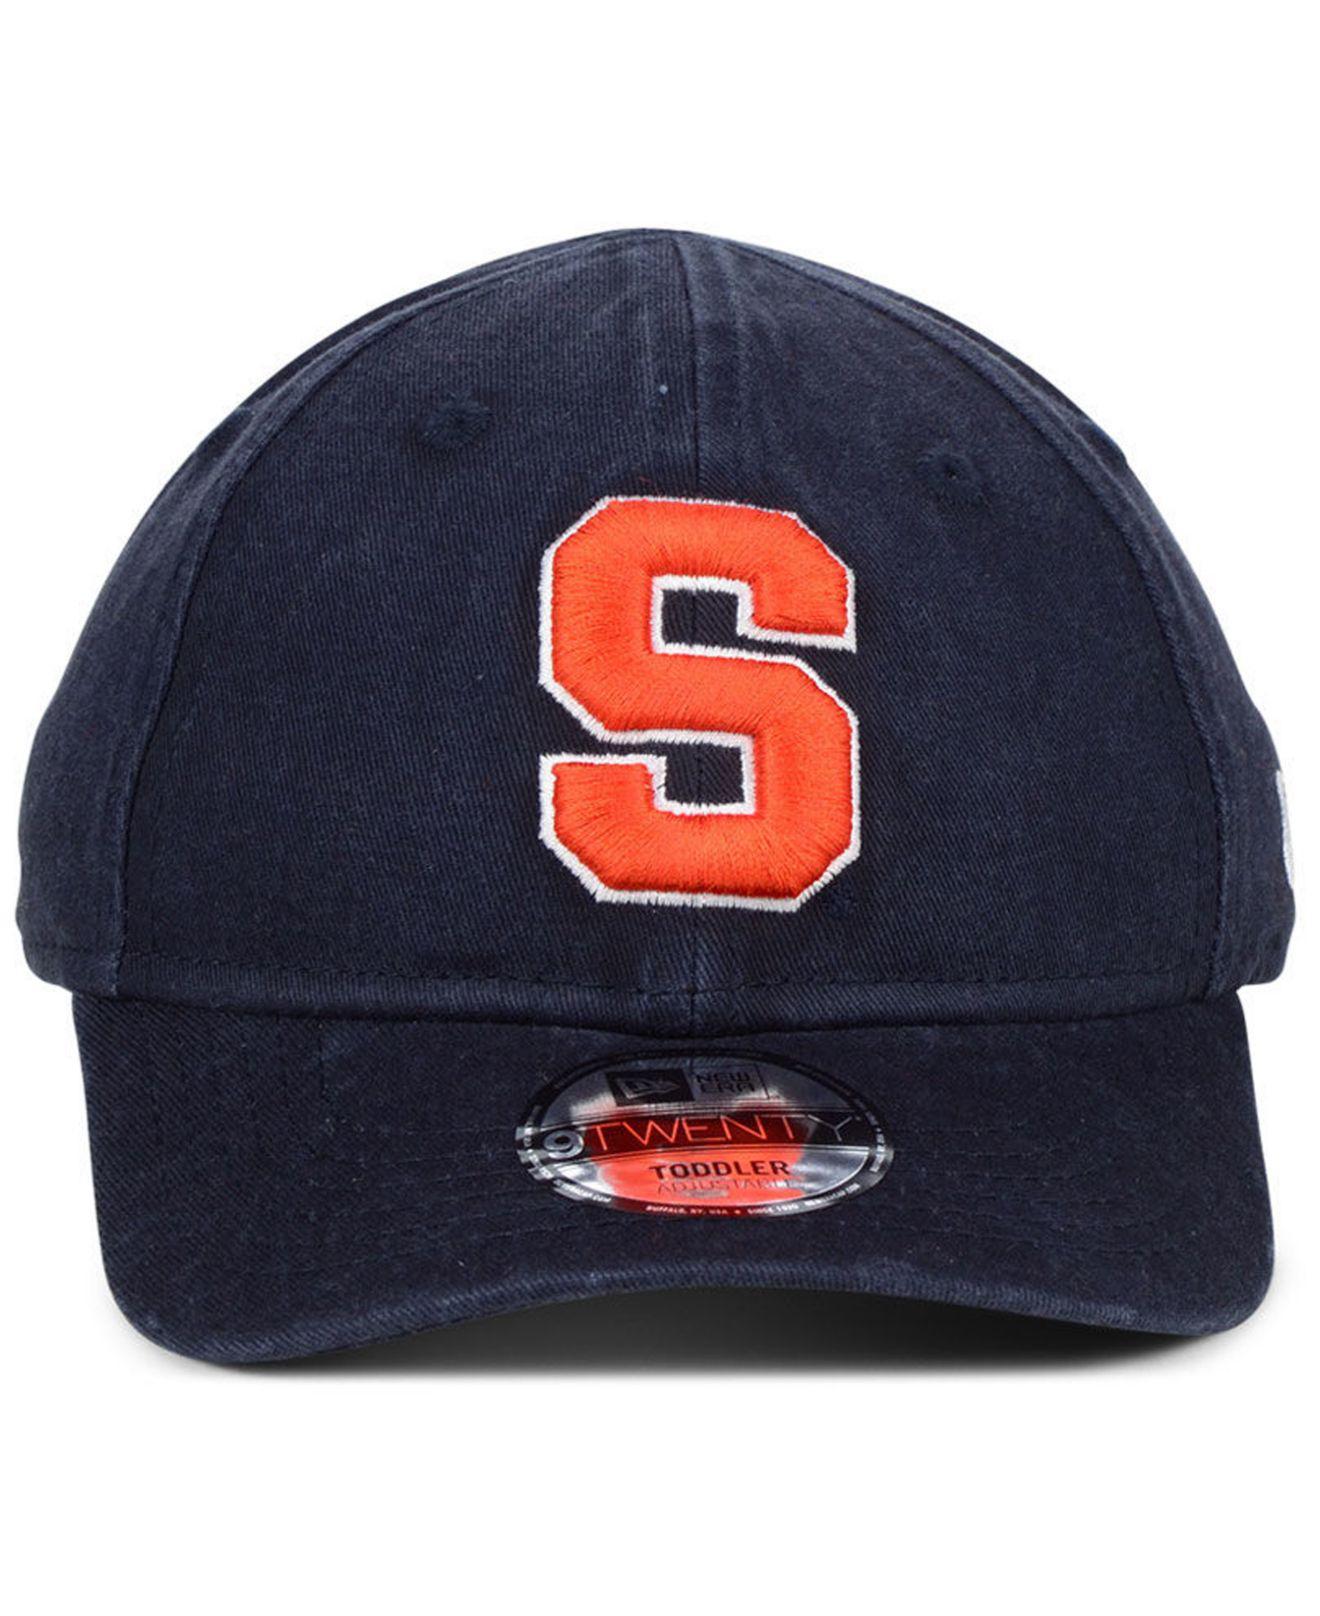 online store fd560 a98f6 ... best price lyst ktz toddlers syracuse orange junior 9twenty cap in blue  for men f2f37 5ea51